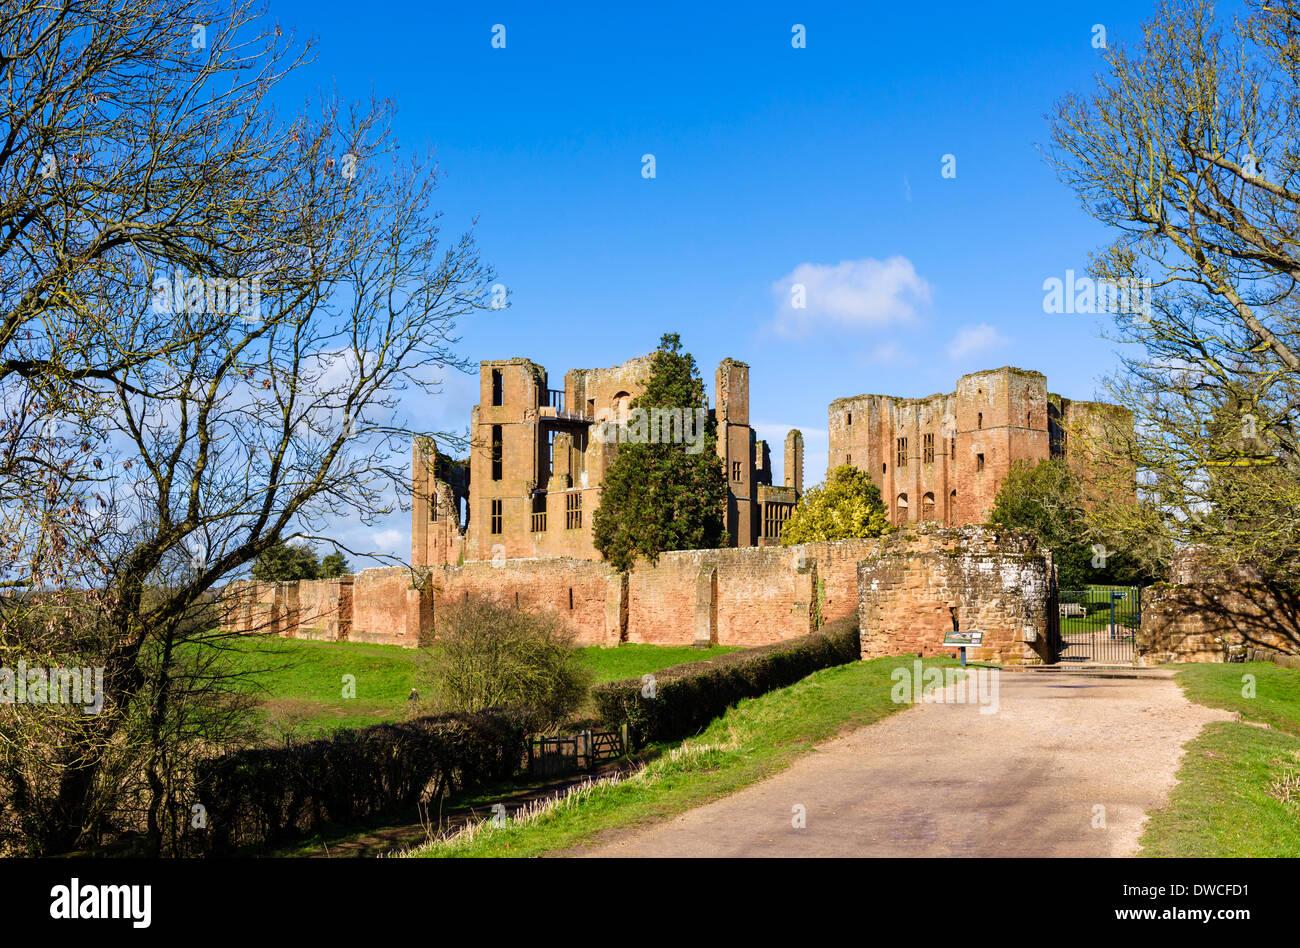 The ruins of 13thC Kenilworth Castle, Warwickshire, England, UK - Stock Image